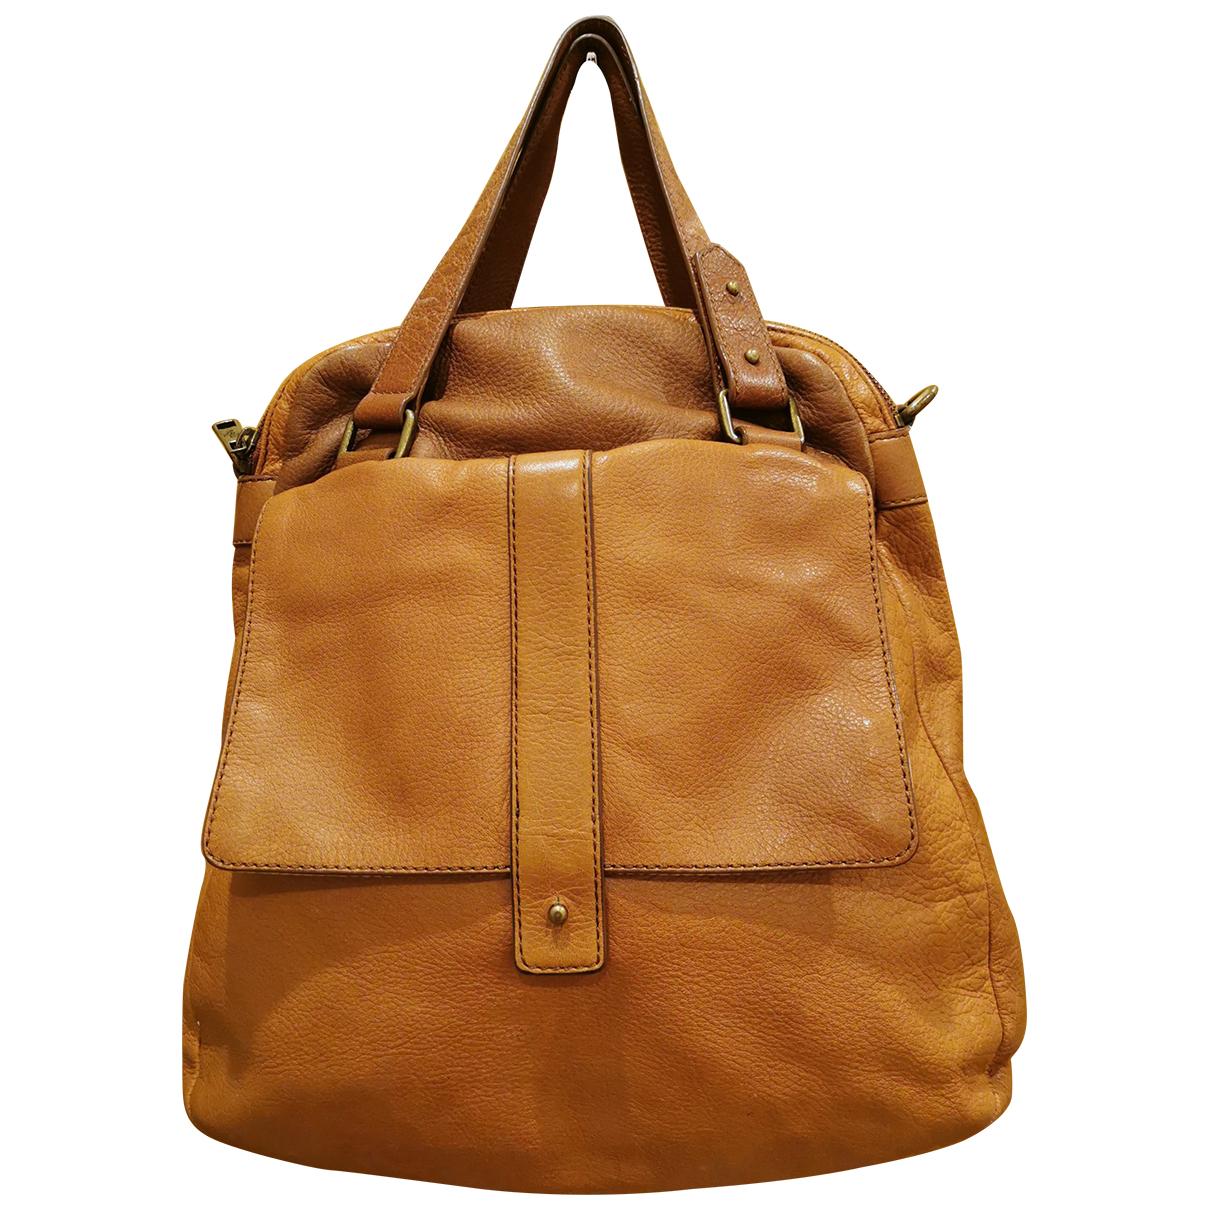 Bimba Y Lola \N Handtasche in  Kamel Leder